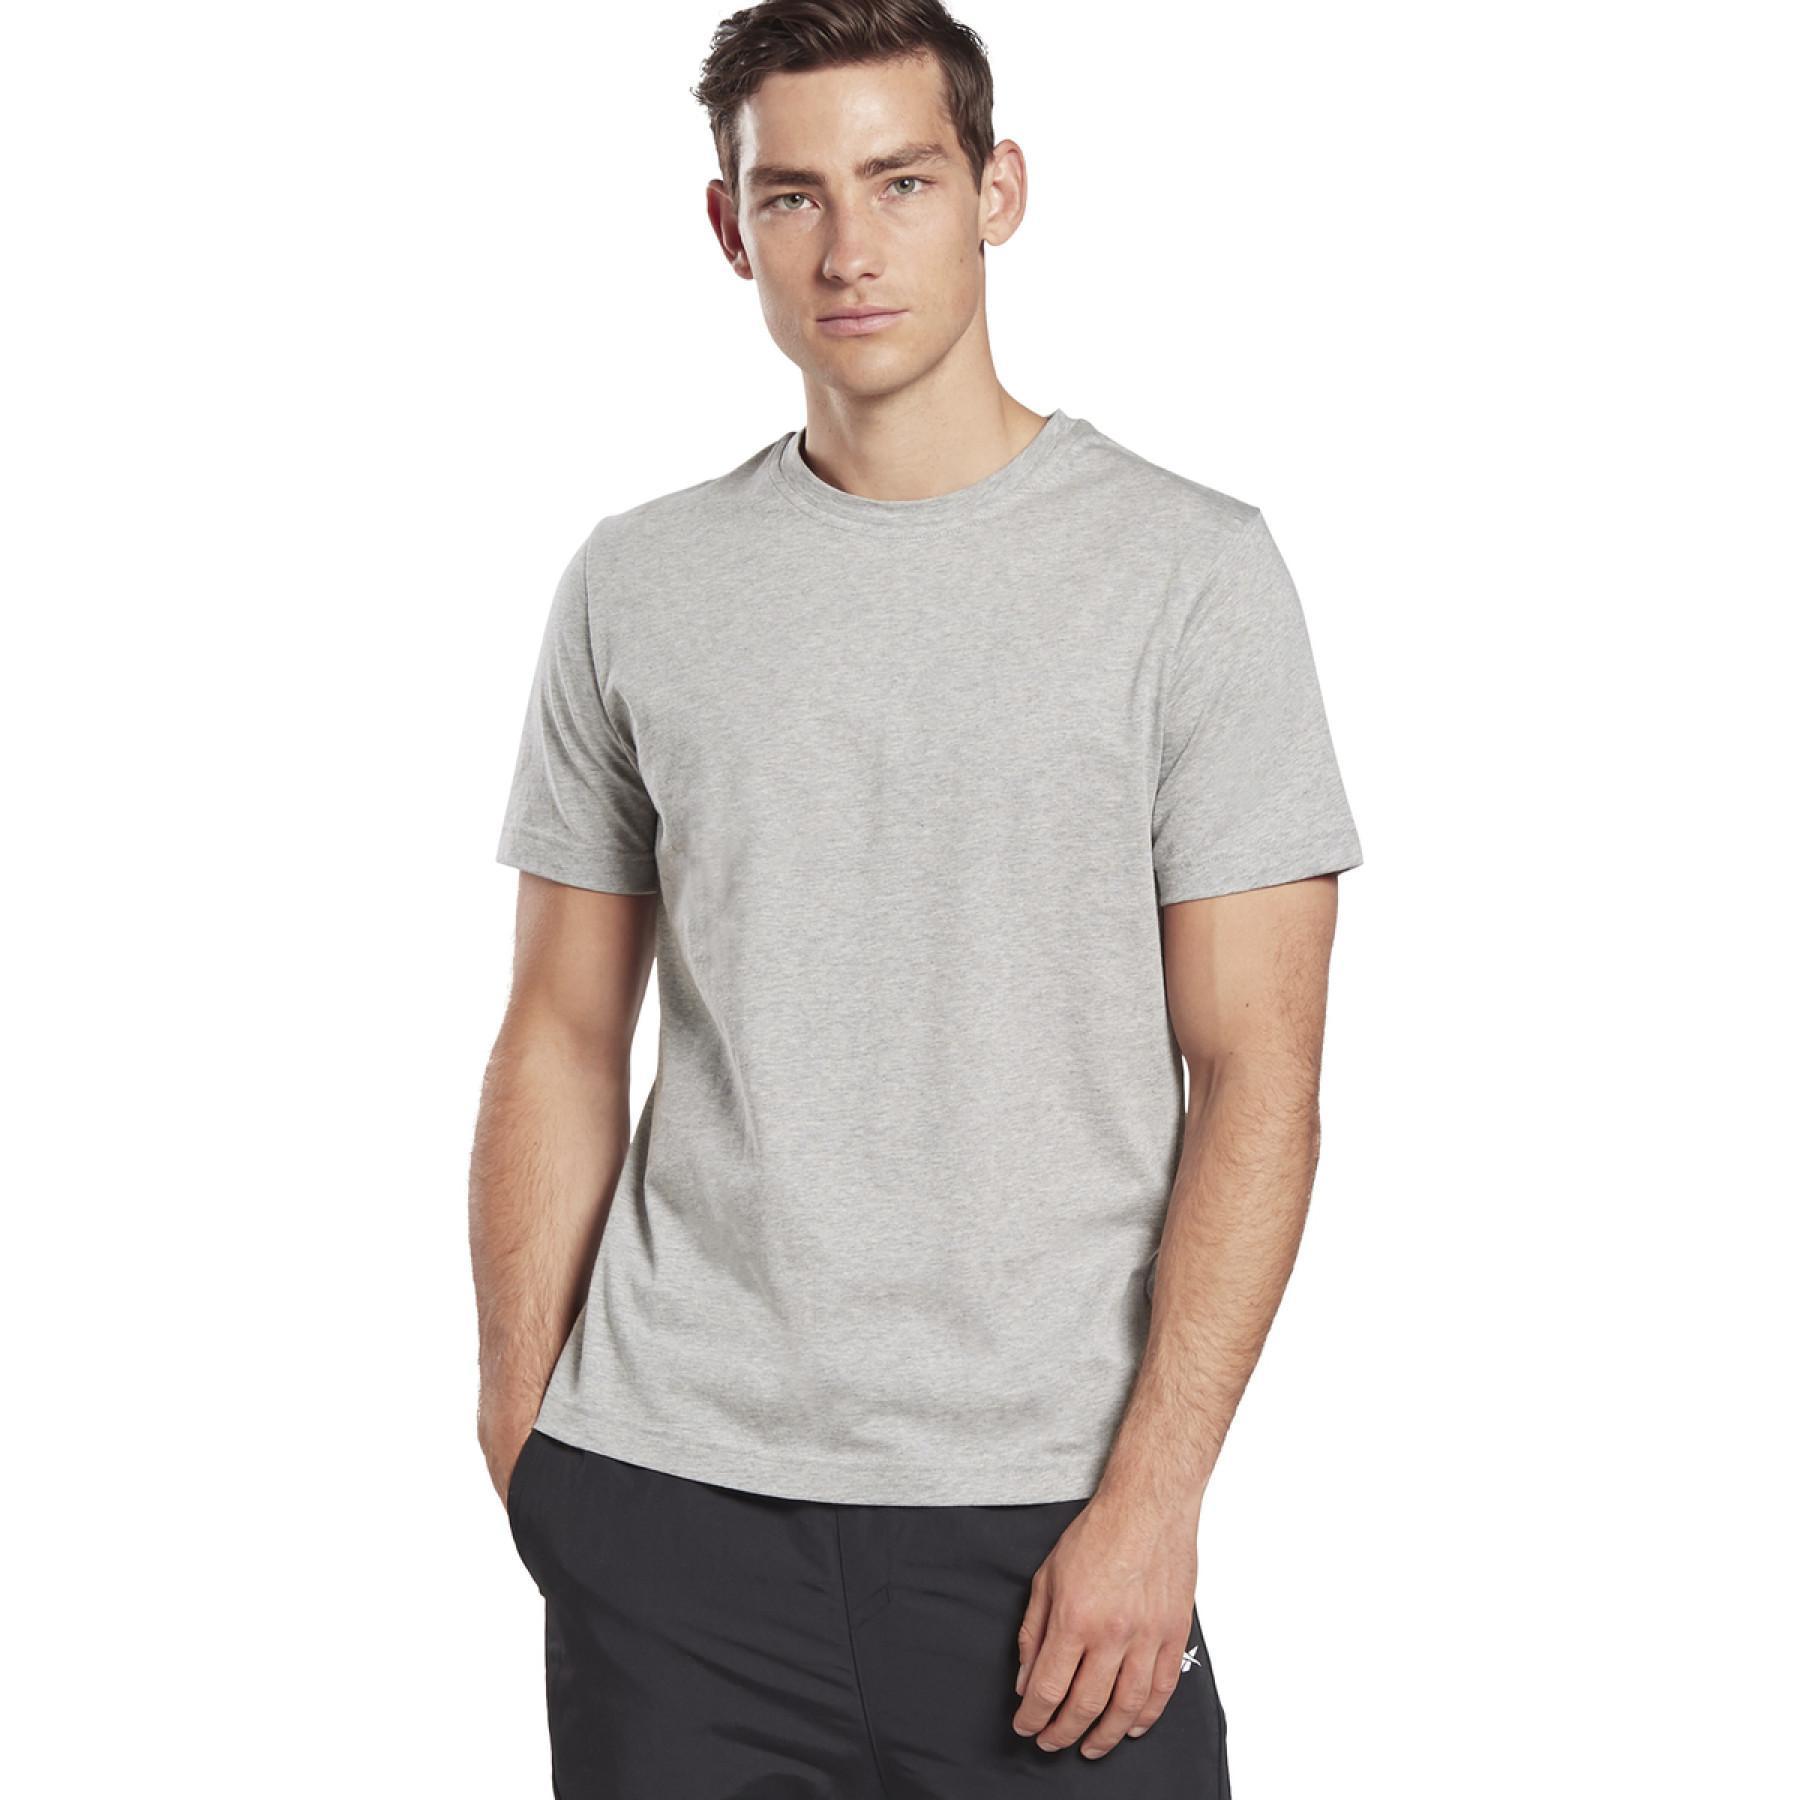 Reebok GB Cotton Vector T-shirt